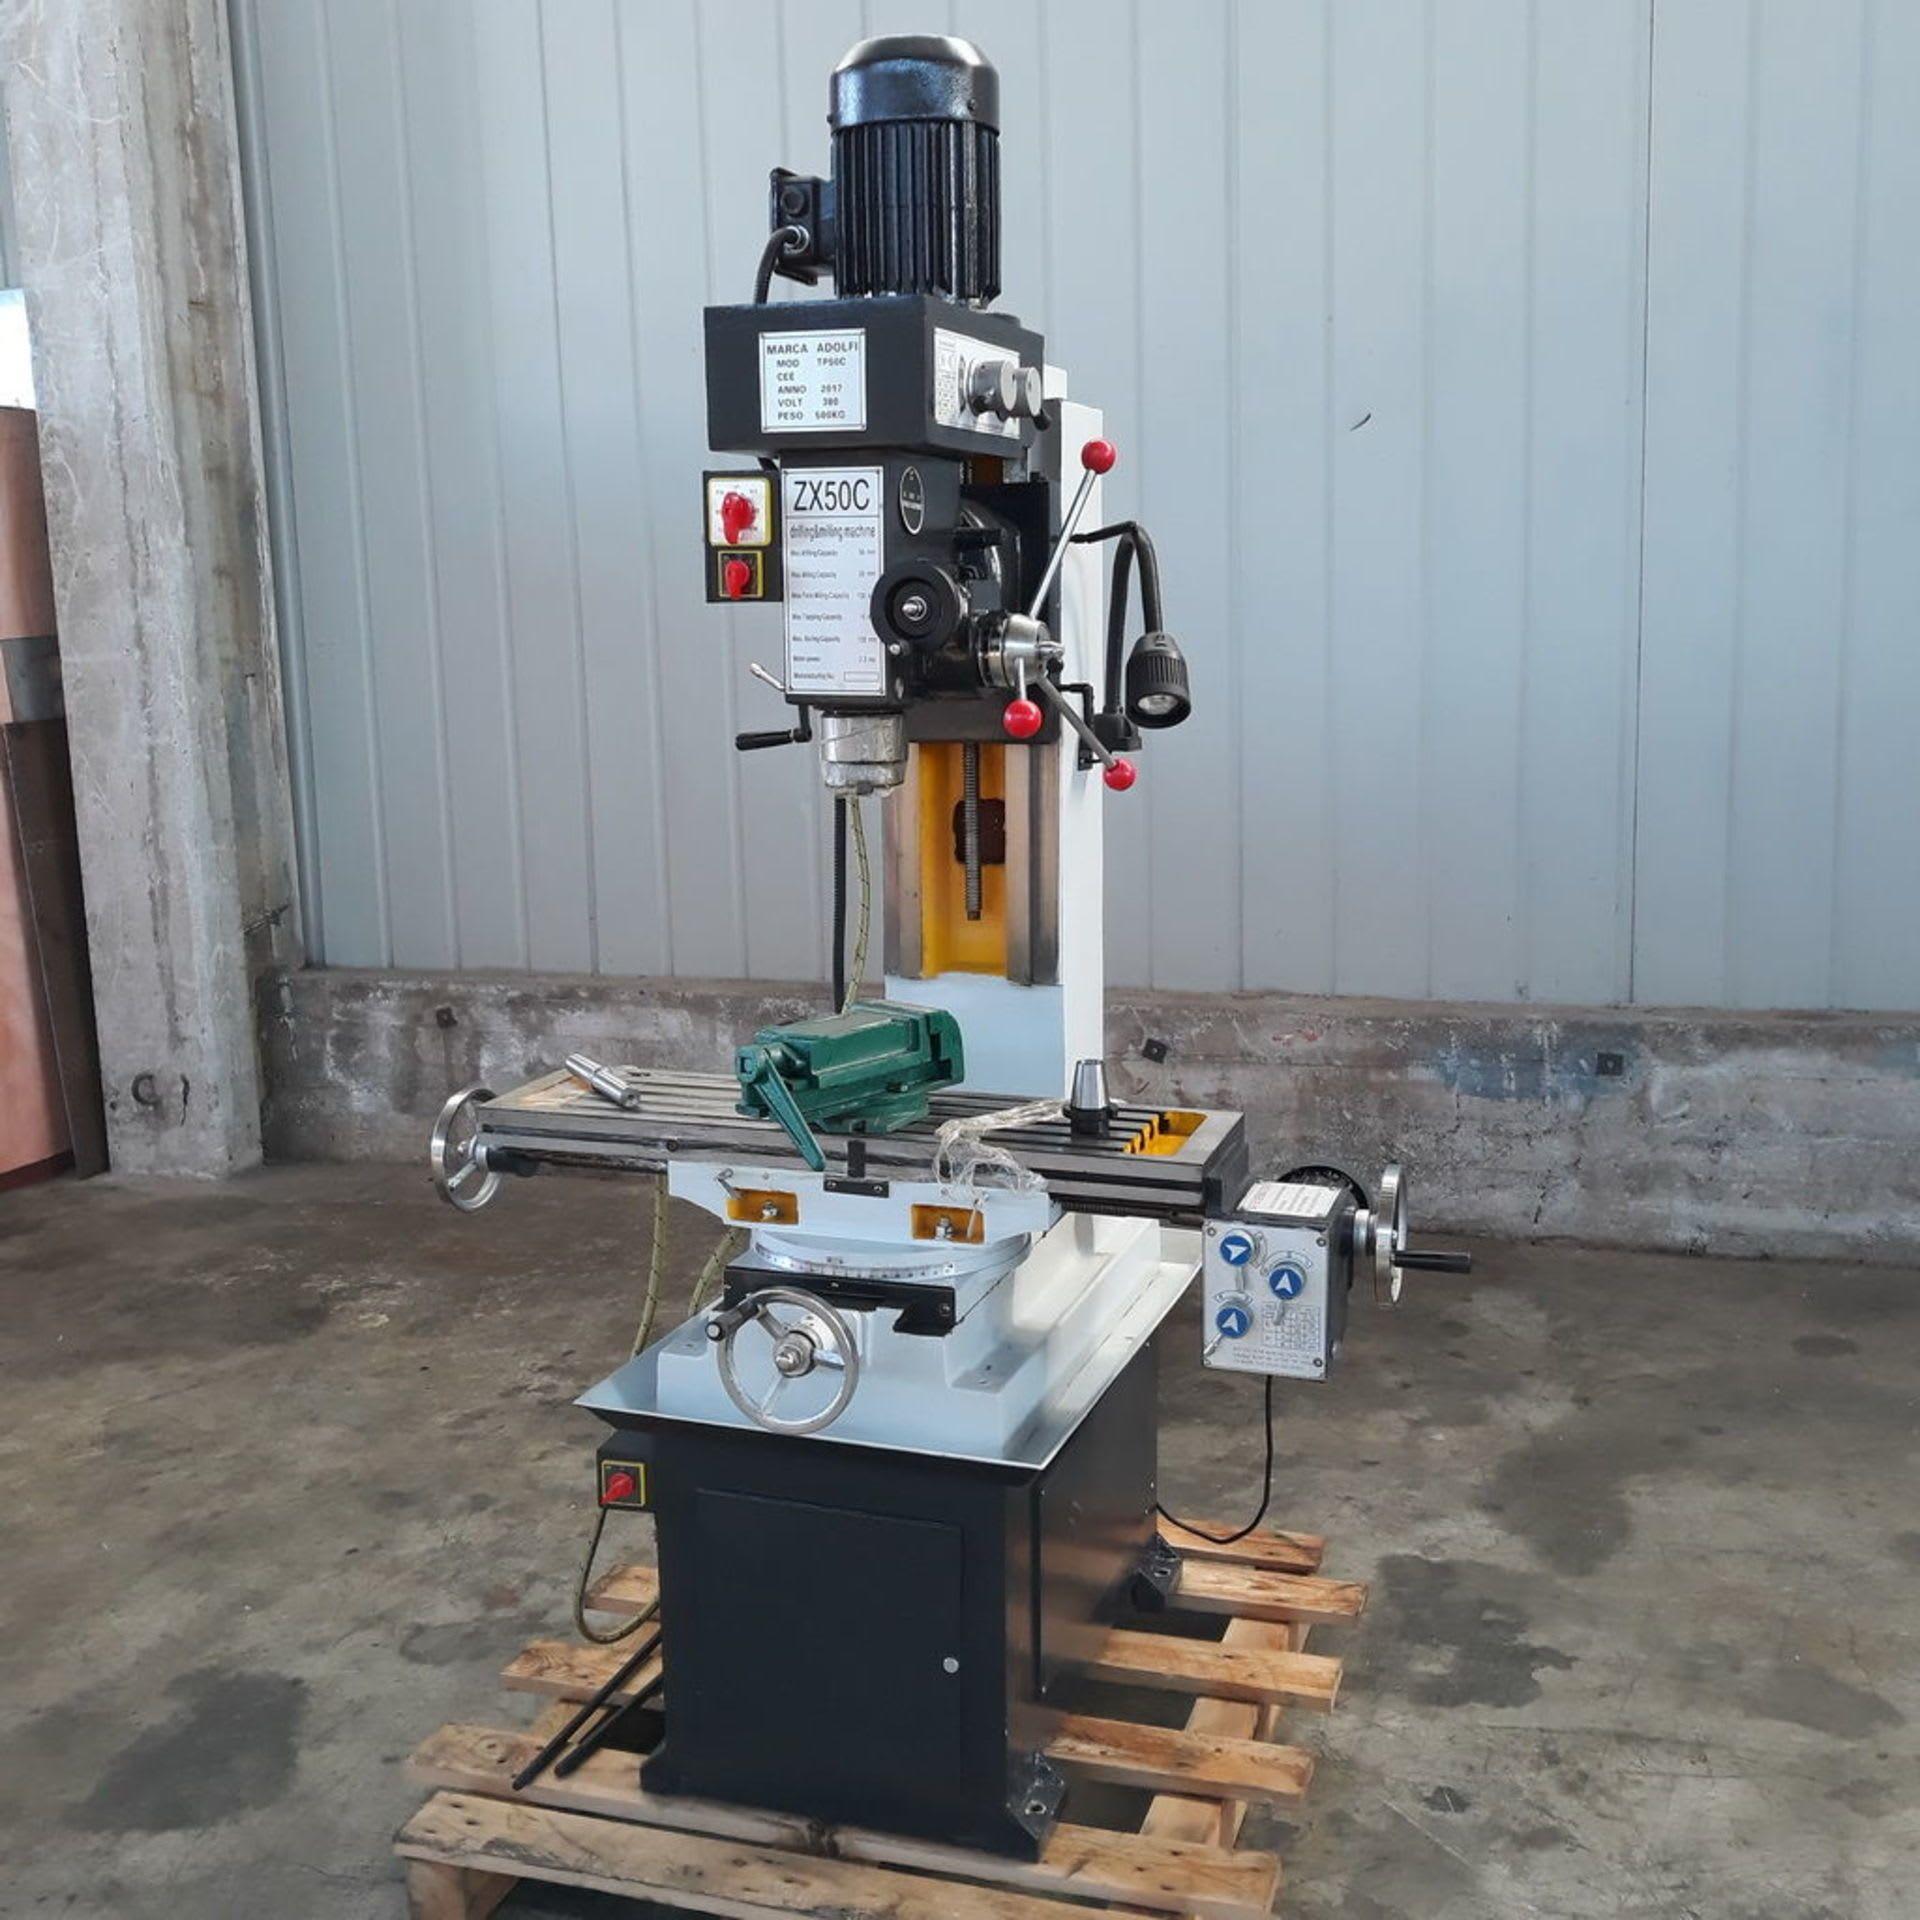 ADOLFI TP50C Automatik-Bohr- und Fräsmaschine